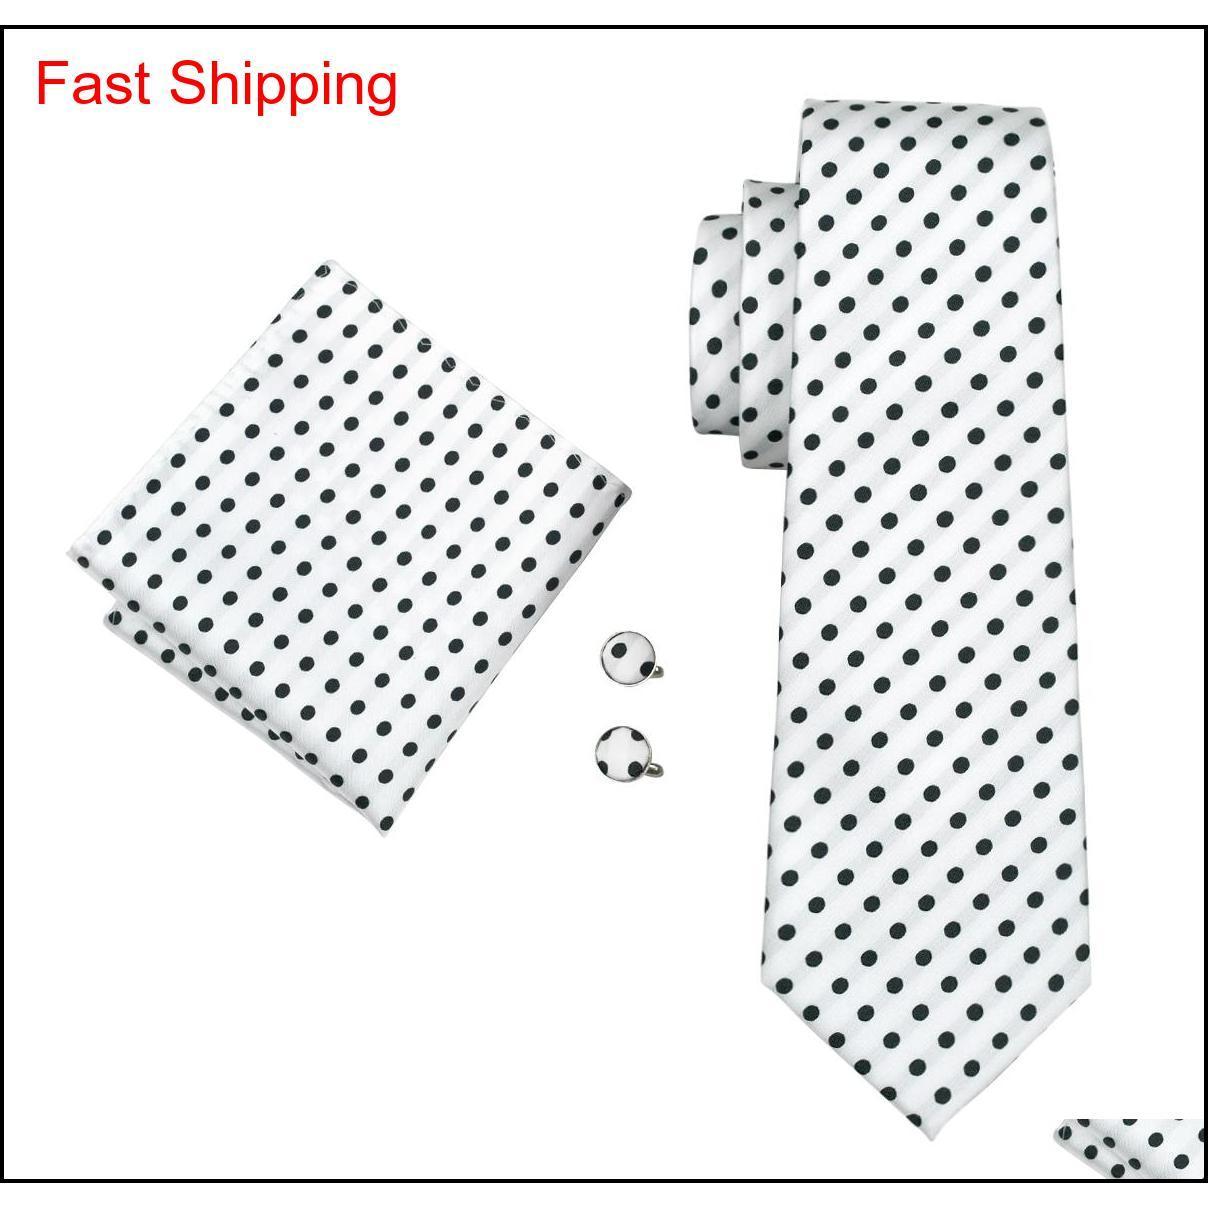 CLASSIC Silk Mens Collo Cravatta Dot Tie Set Set di cravatta Bianco Ties Tie Tie Hanky Gemelli Set Jacquard Tessuto Meeting Business We Qylqkn Nana_Shop